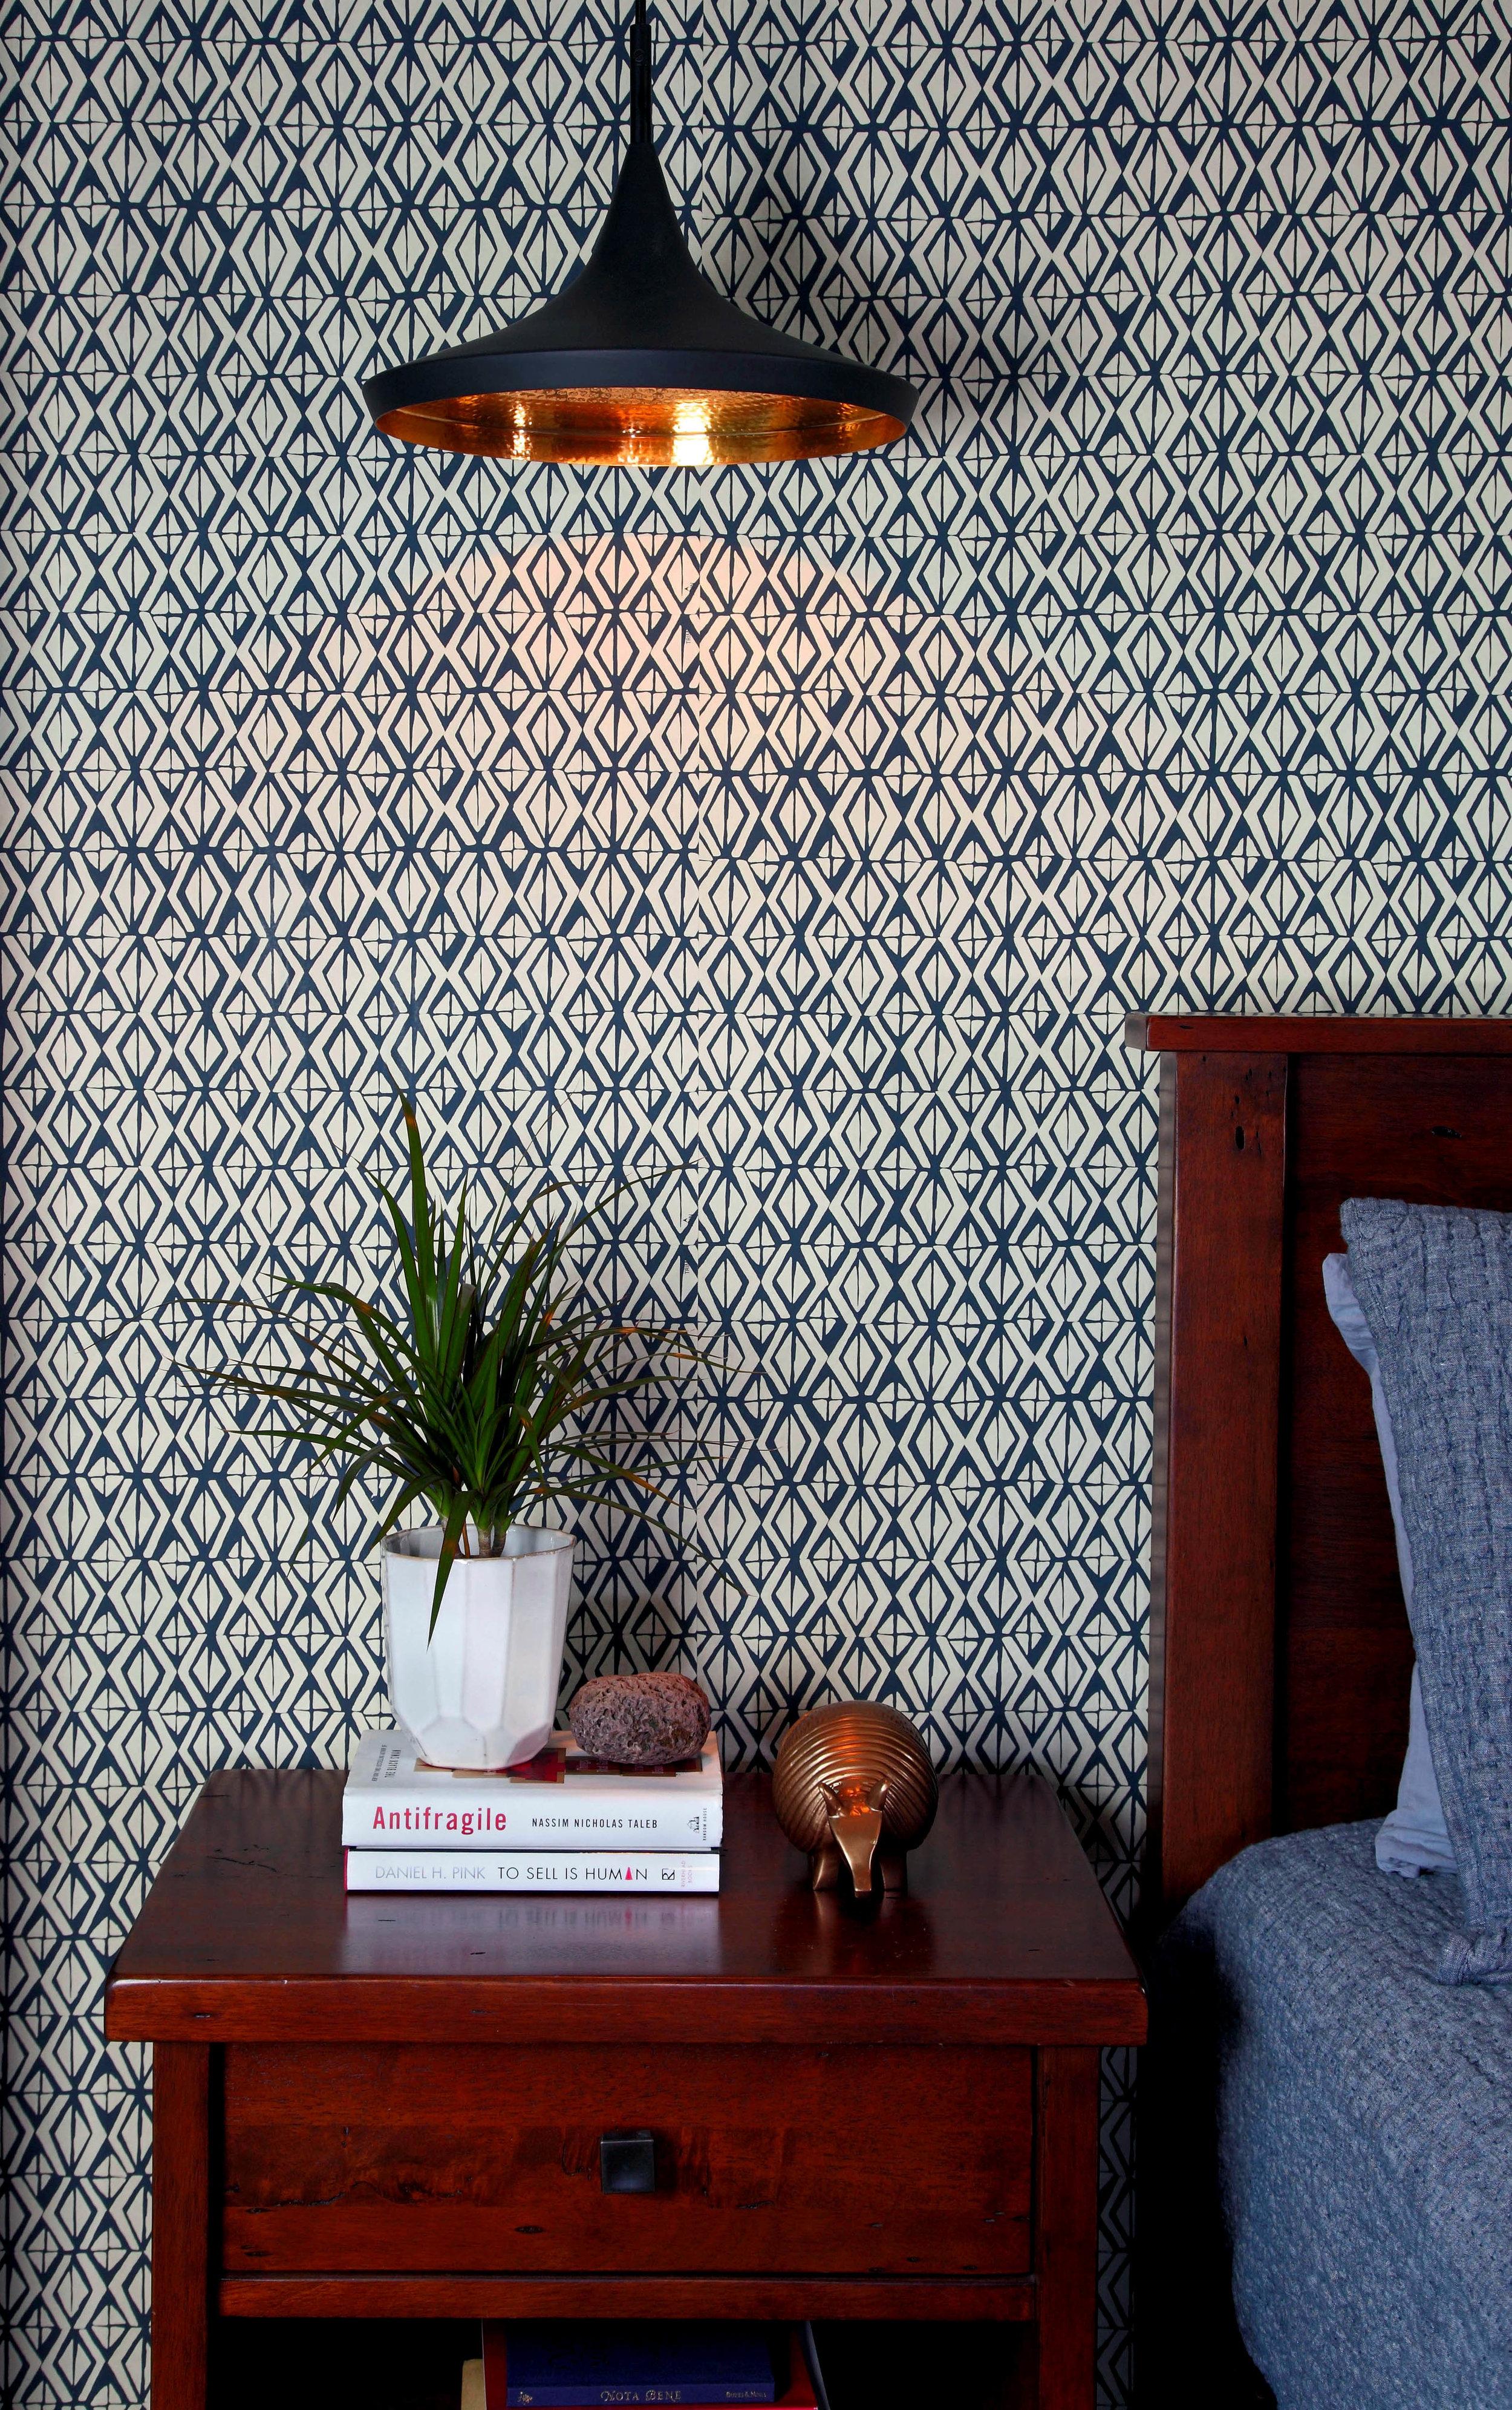 Sarah-barnard-design-modern-bachelorpad-wallpaper.jpg